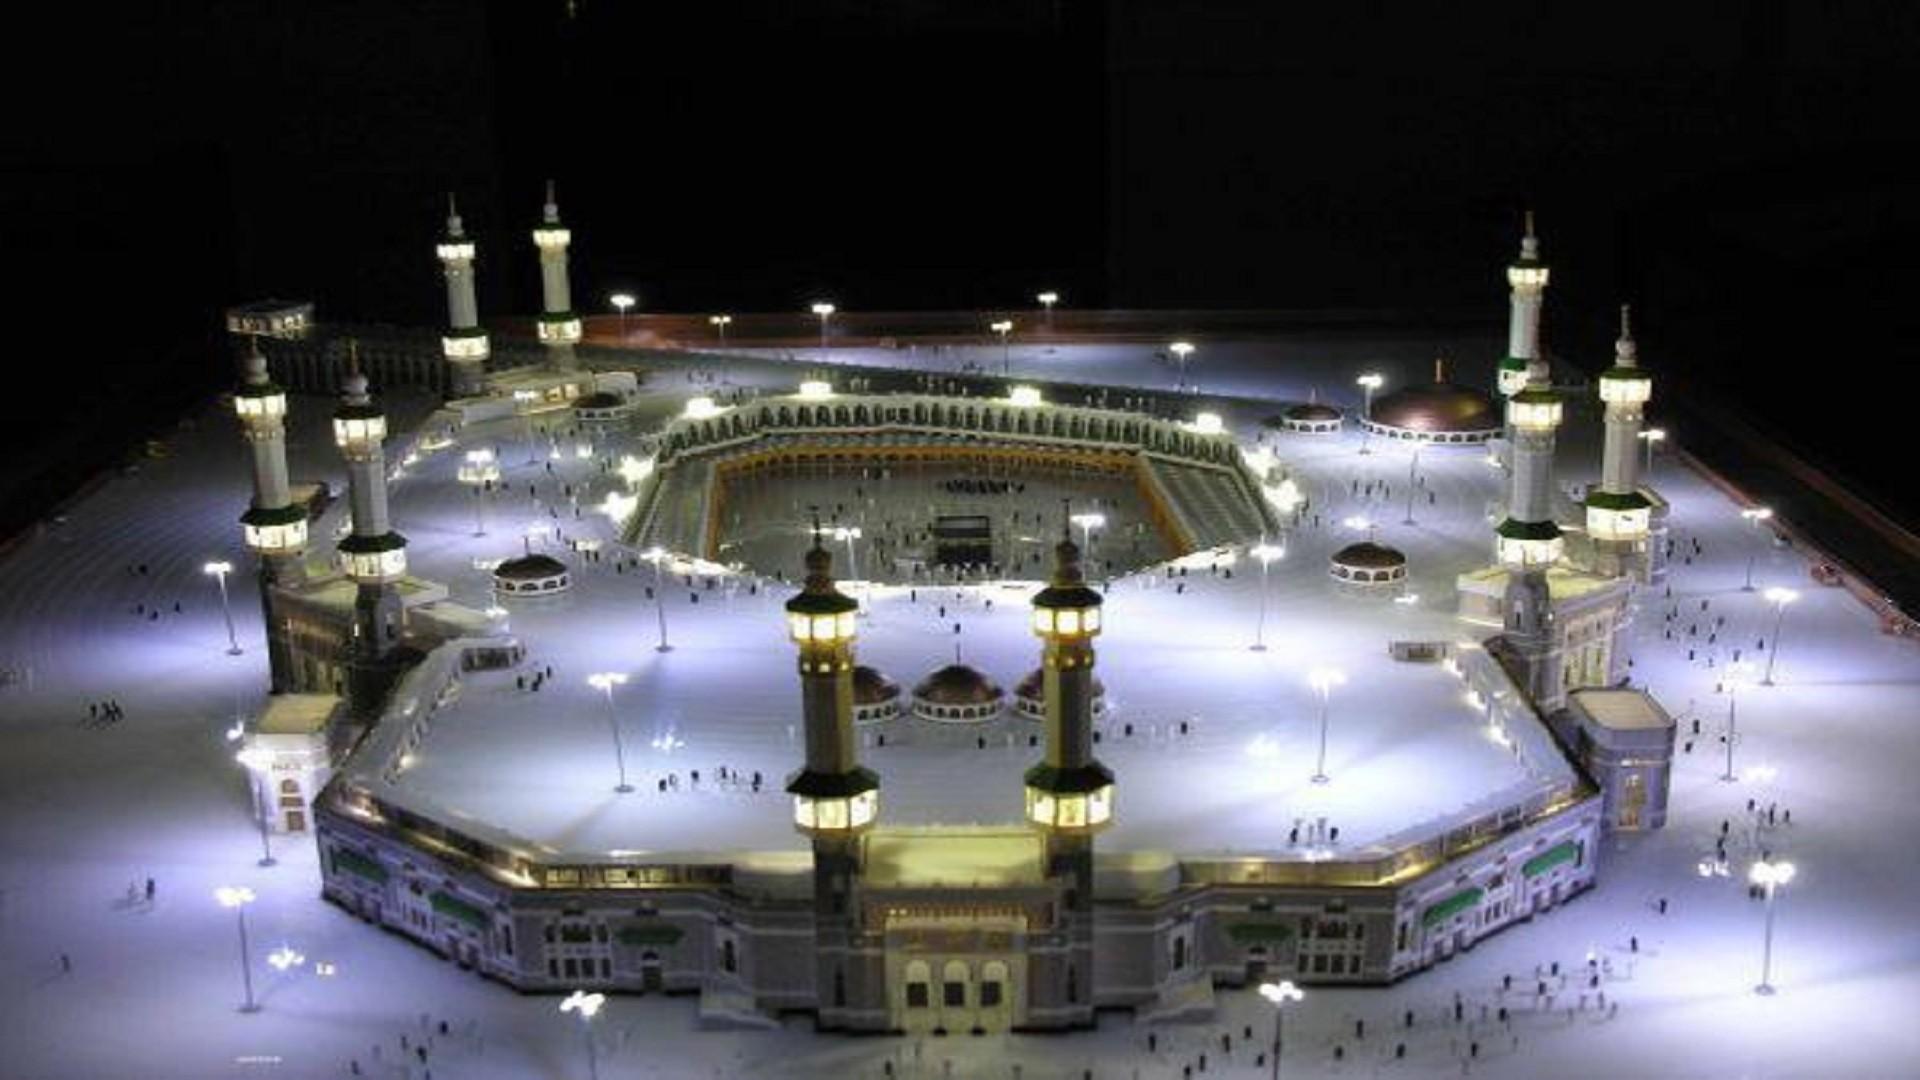 Res: 1920x1080, nice-makkah-night-look-wallpapers-free-hd-downloaded